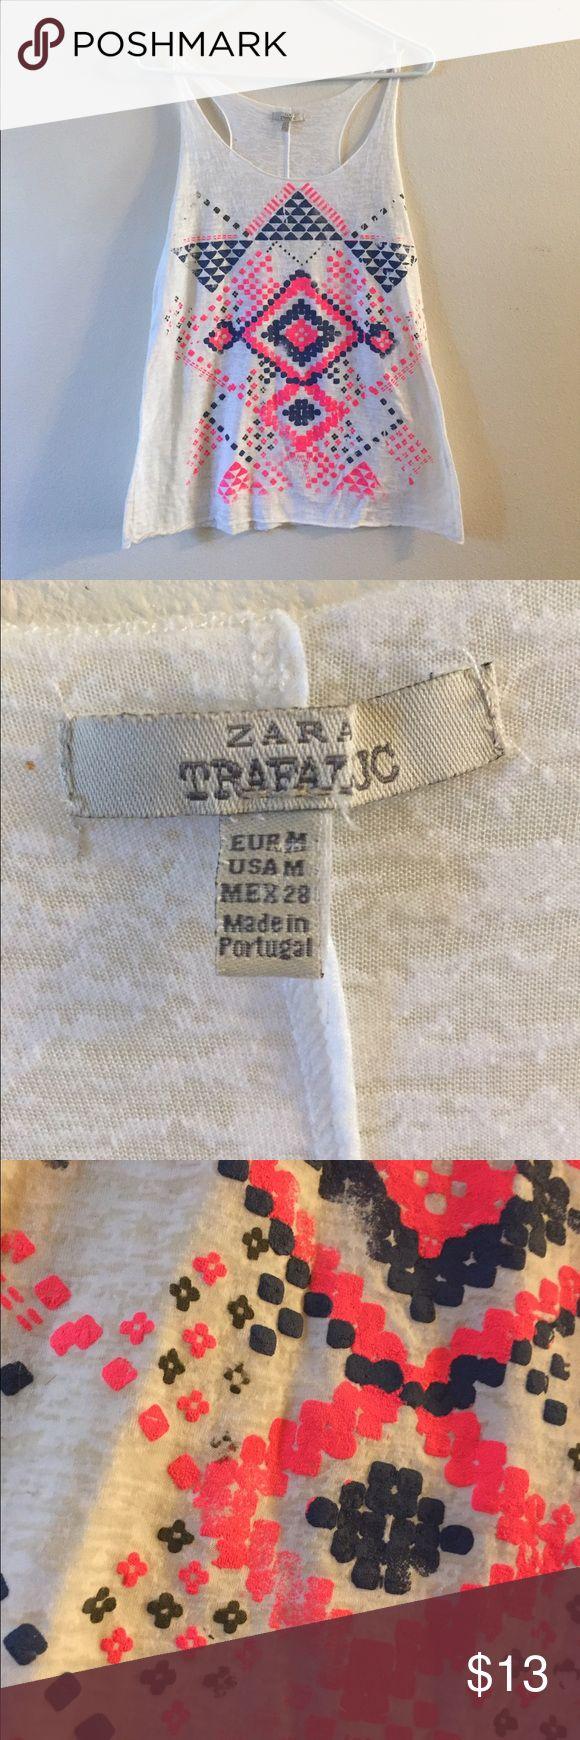 Zara Bright Tribal Tank Top Size M Size M Tank Top Tribal pattern Zara Tops Tank Tops